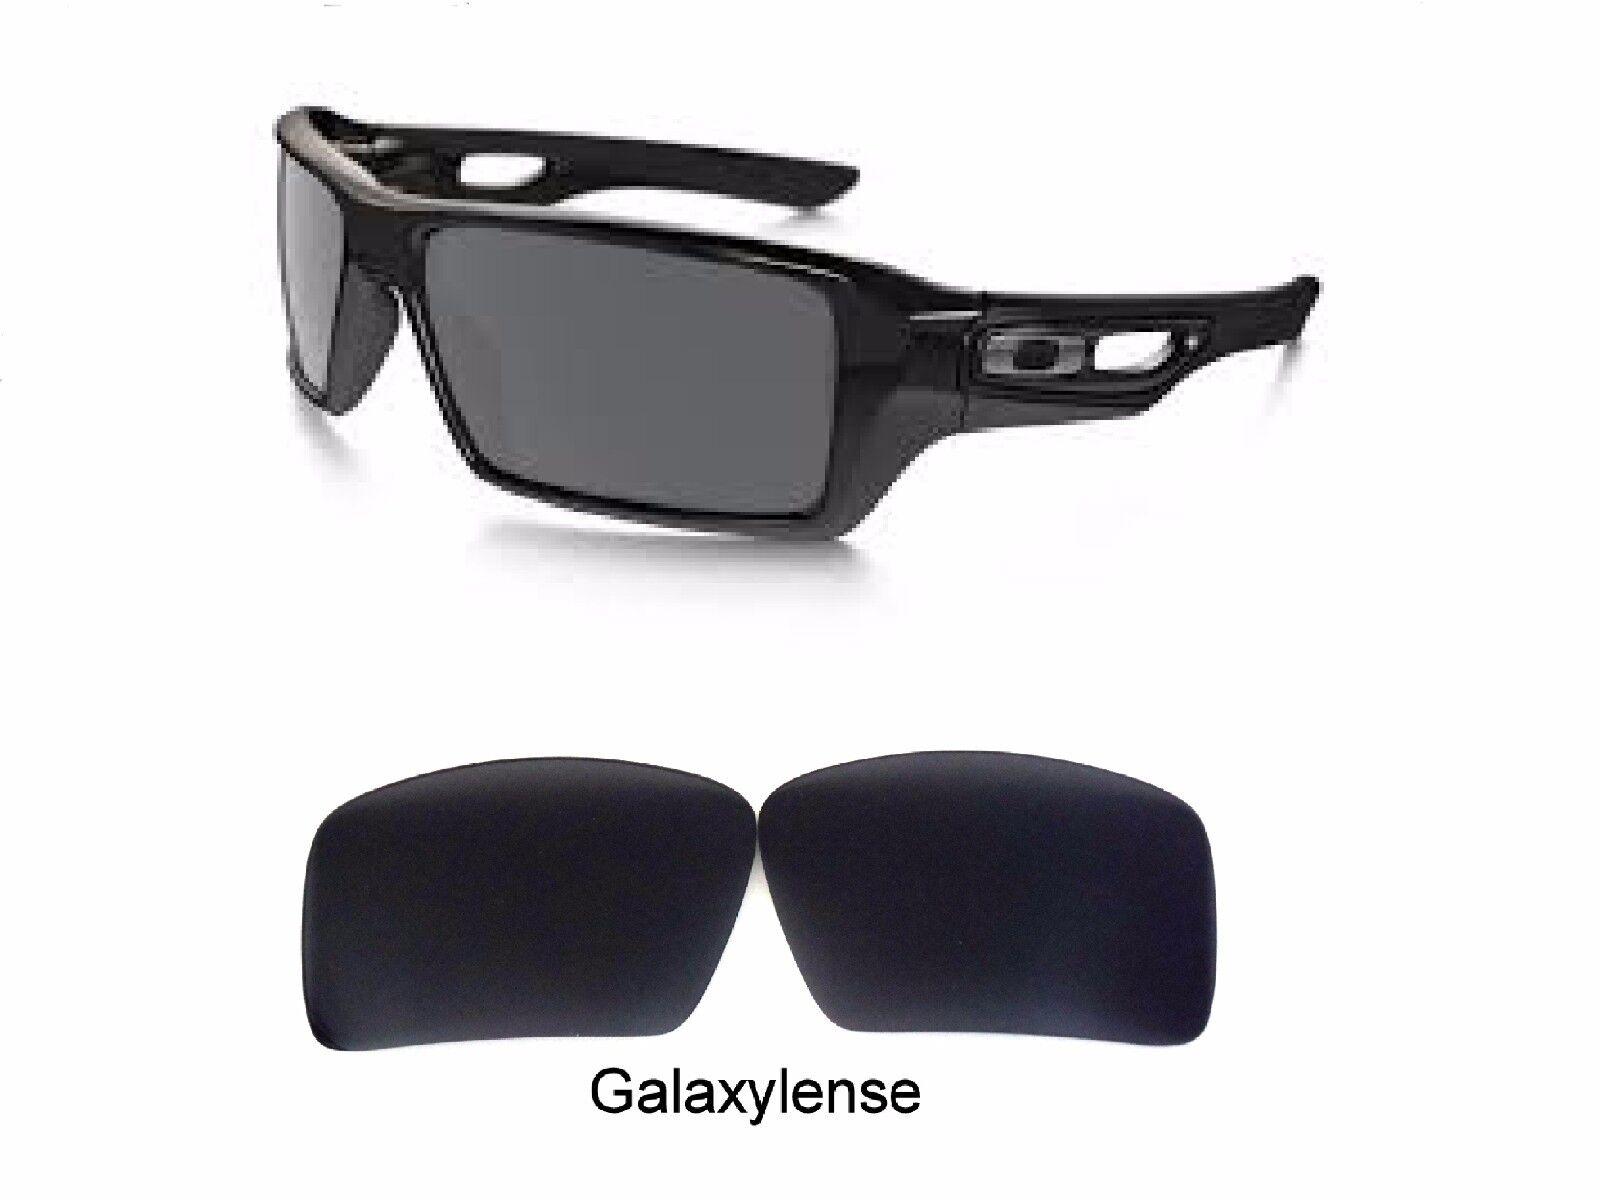 6fdcdd09ee8 Polarizan la galaxia lentes de recambio para Oakley Taco grande Iridium  negro